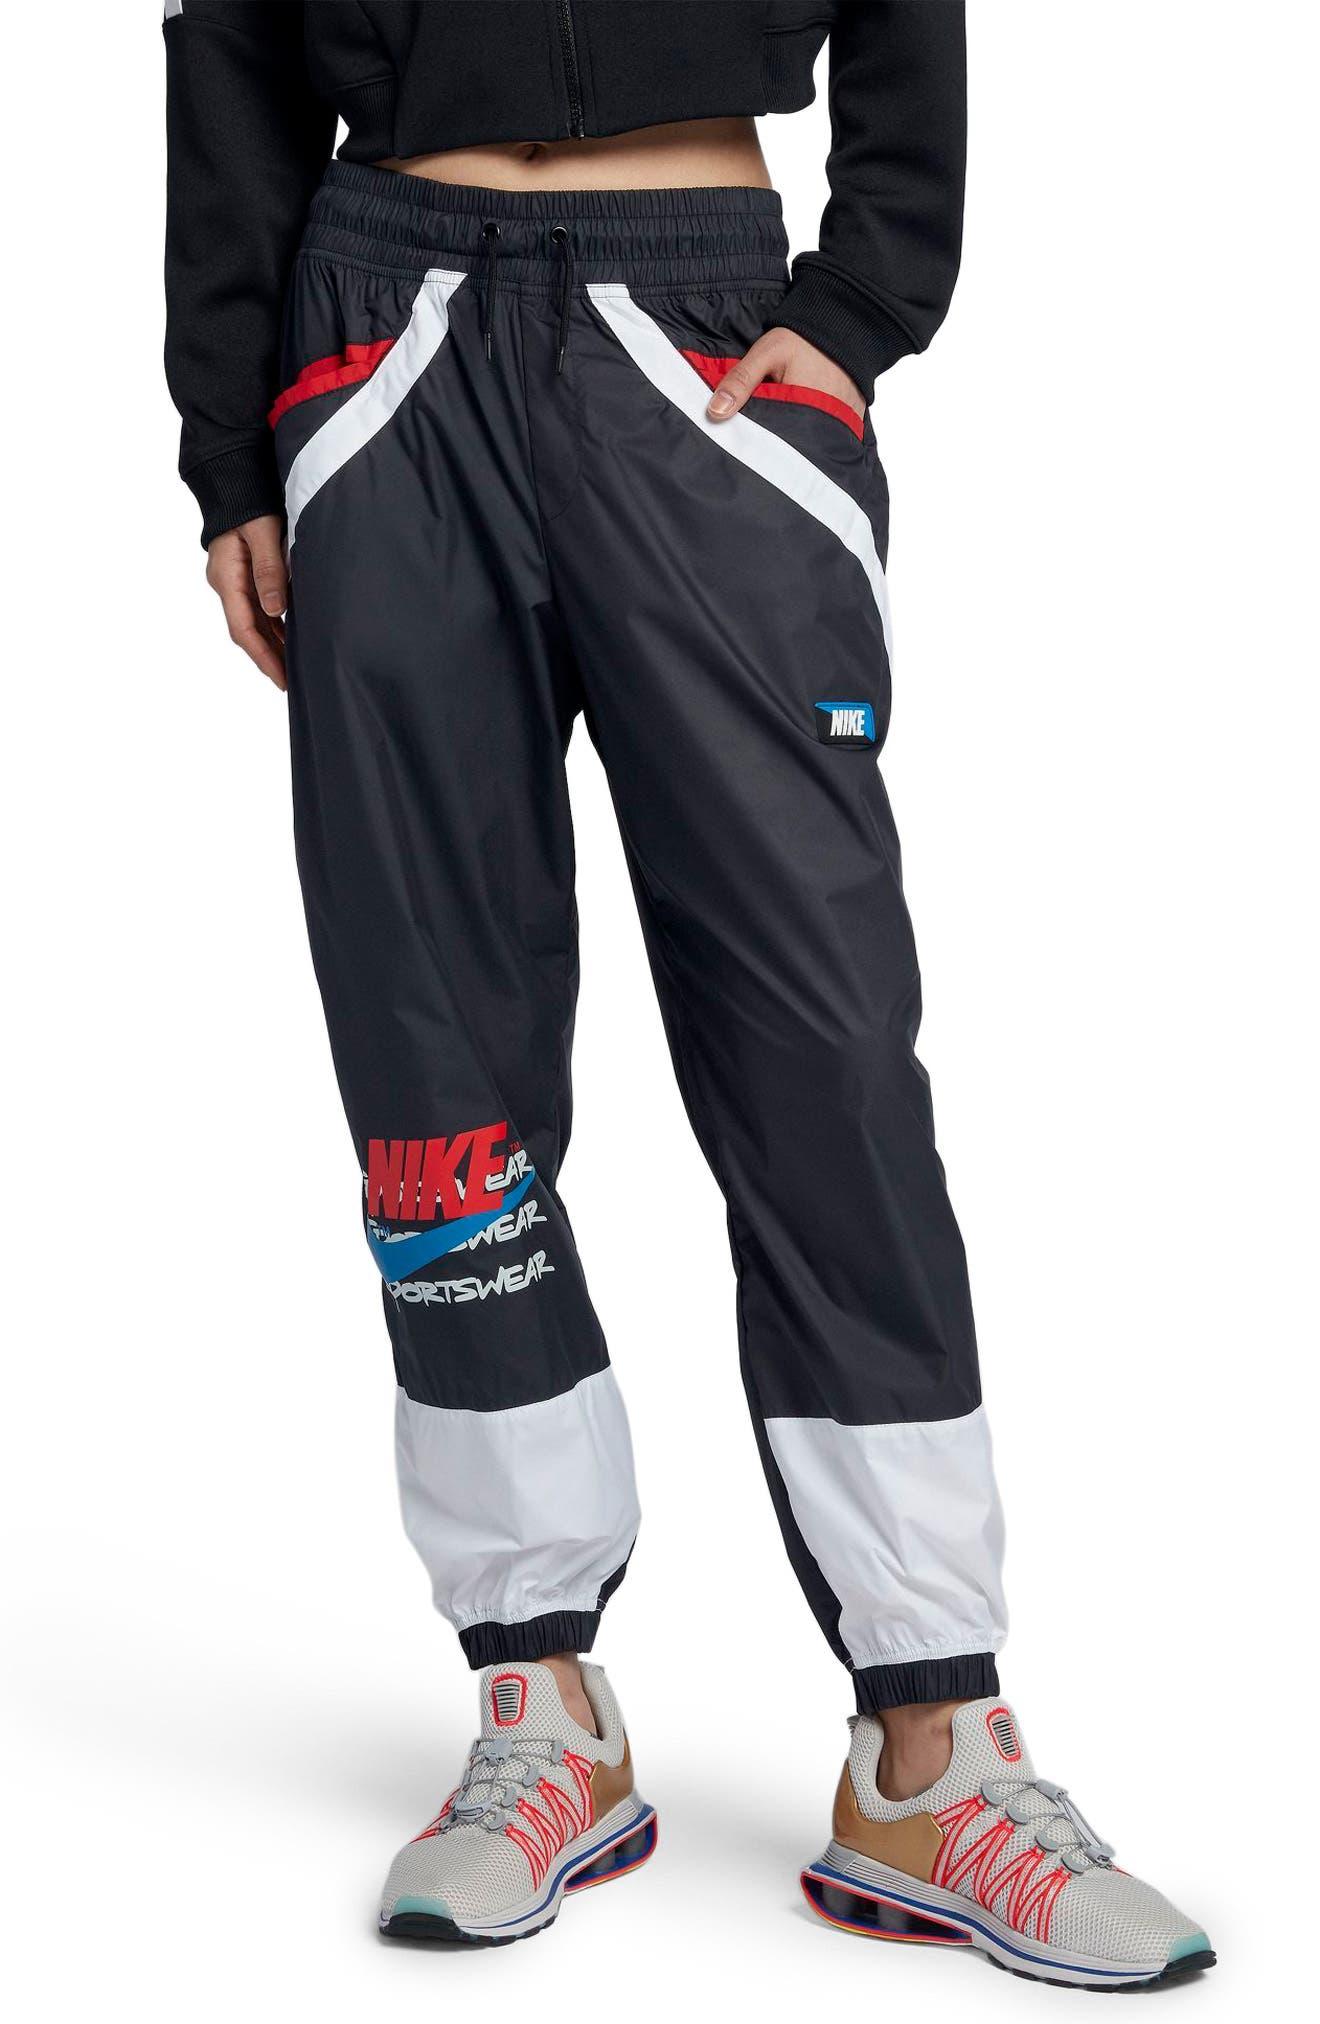 Sportswear Women's Woven Moto Pants,                             Main thumbnail 1, color,